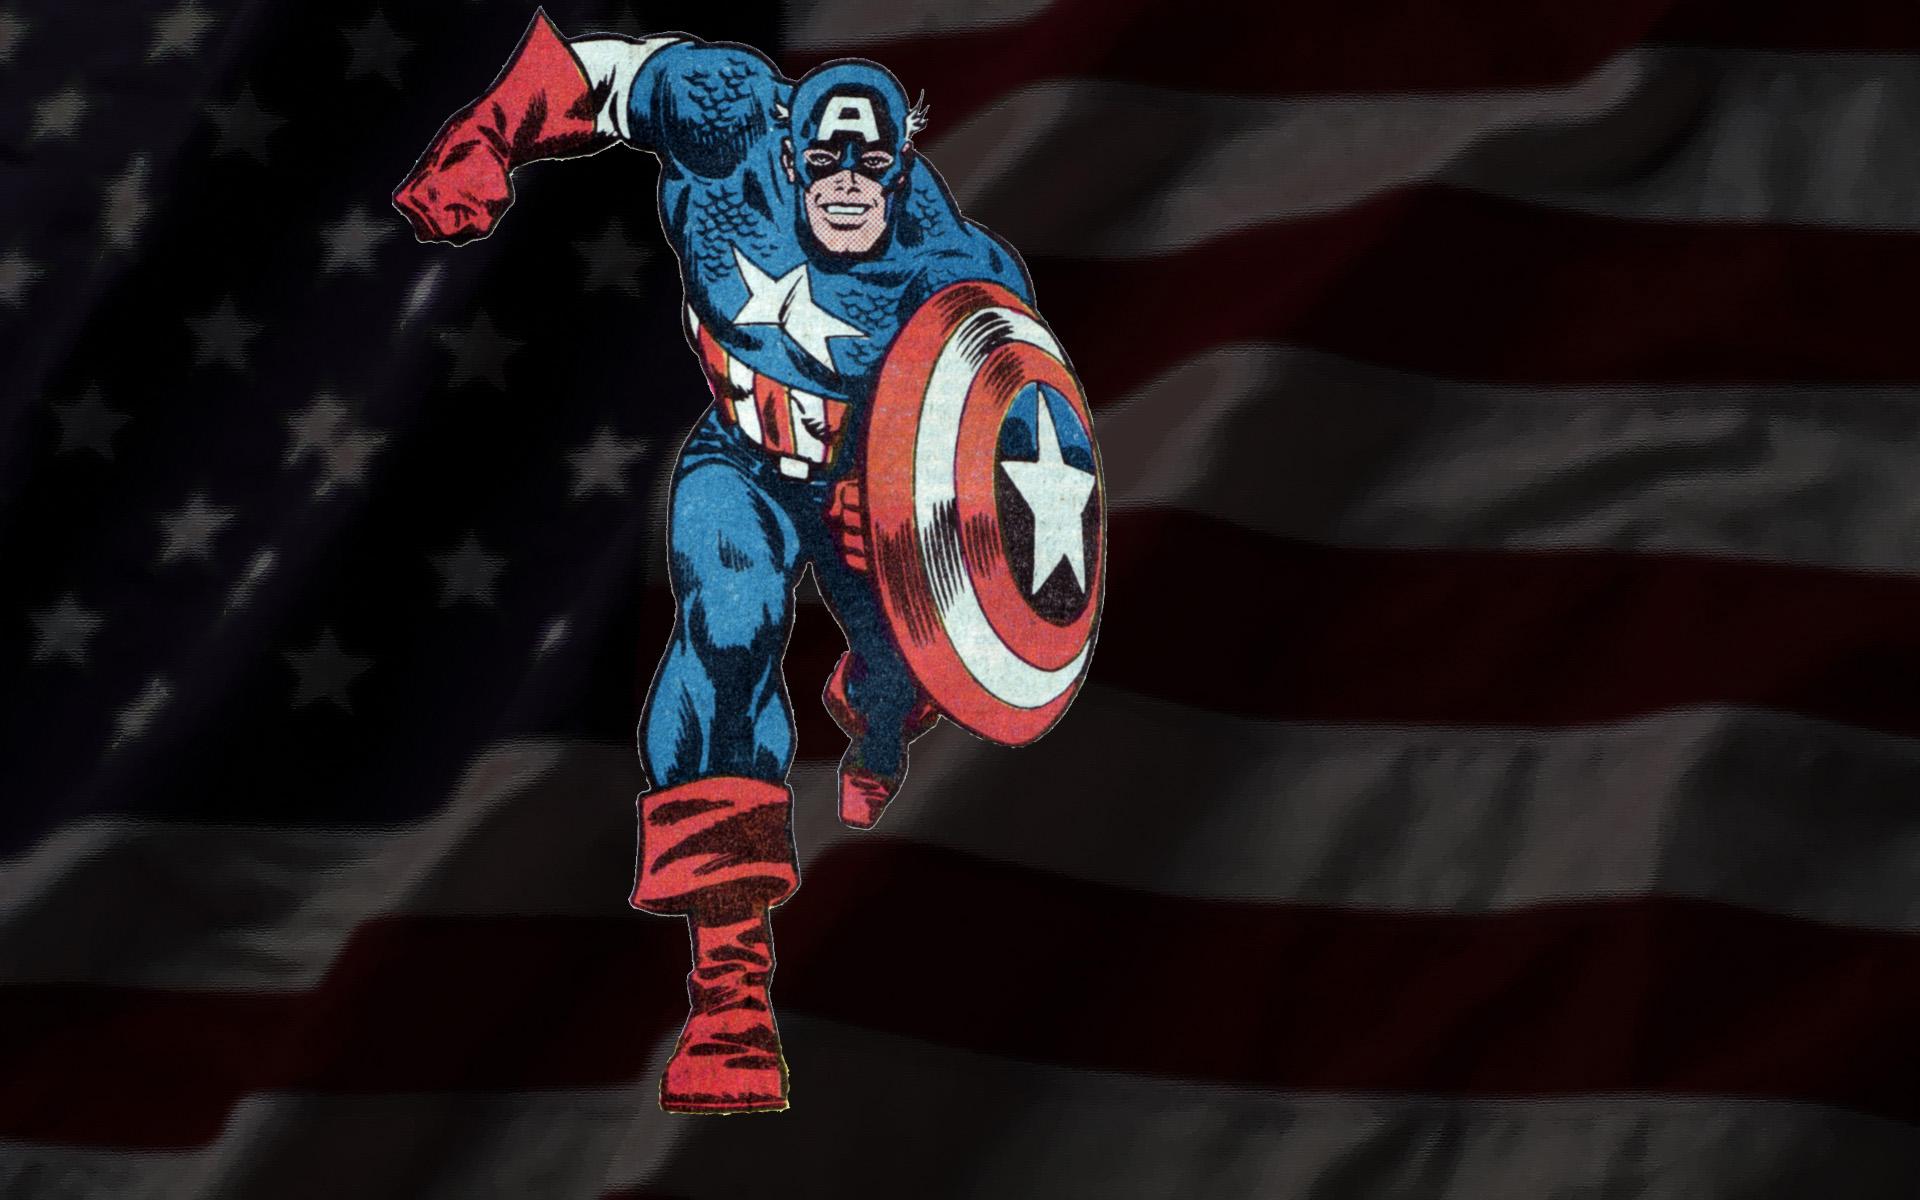 Captain America wallpaper the Hobbit Hole 1920x1200